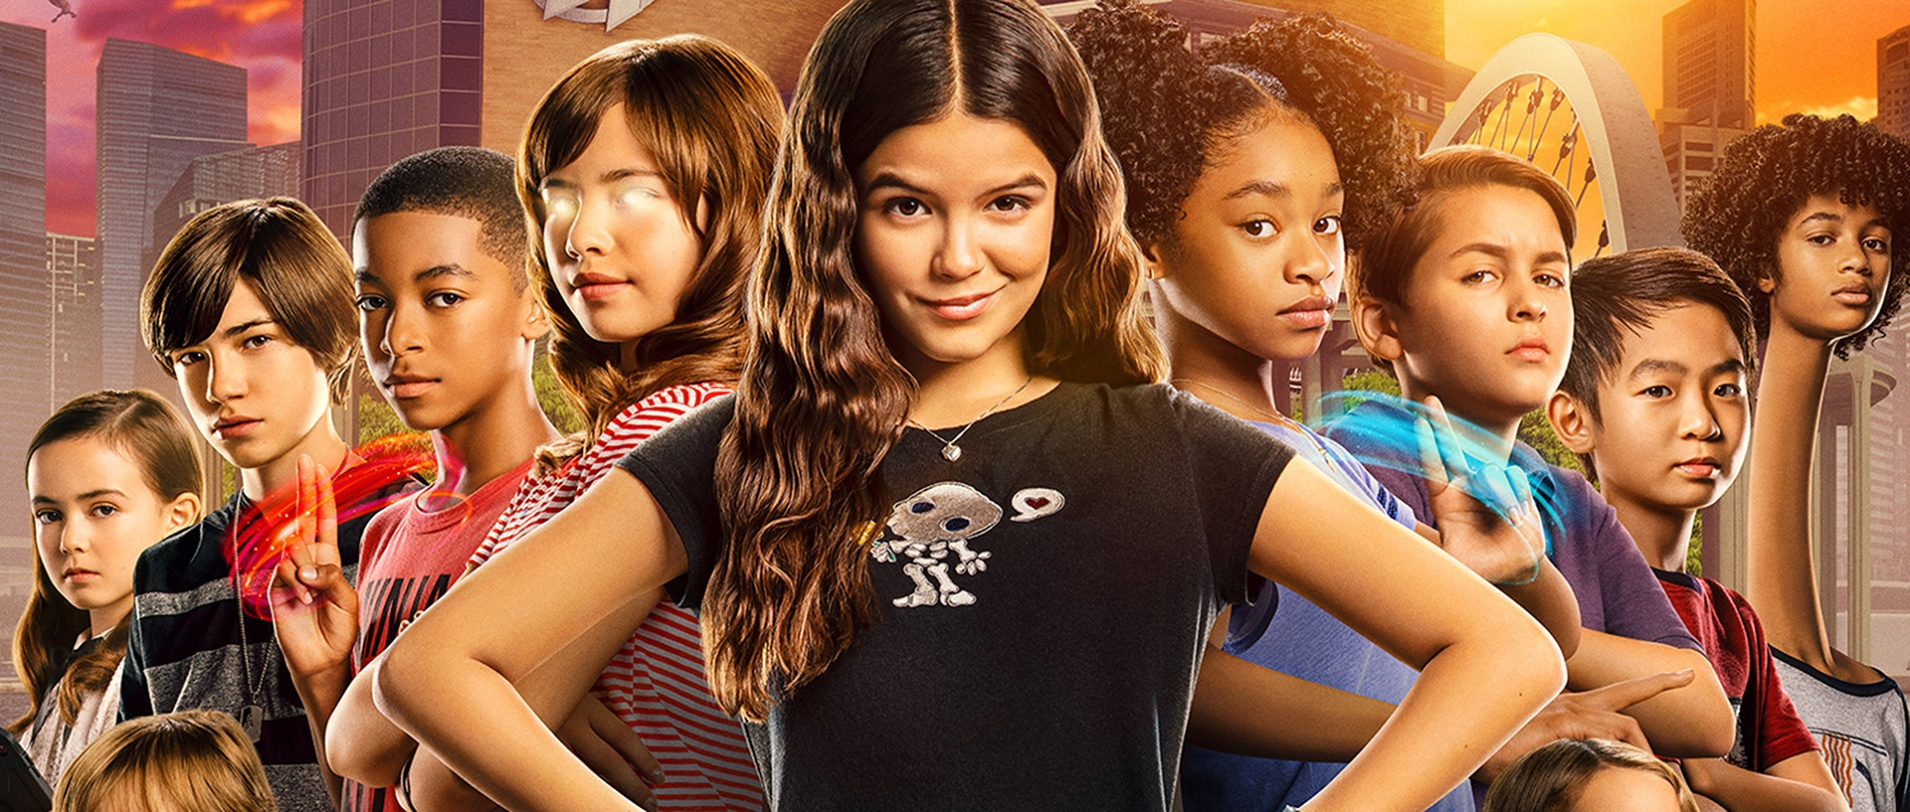 We Can Be Heroes - Poster - Robert Rodriguez - Netflix